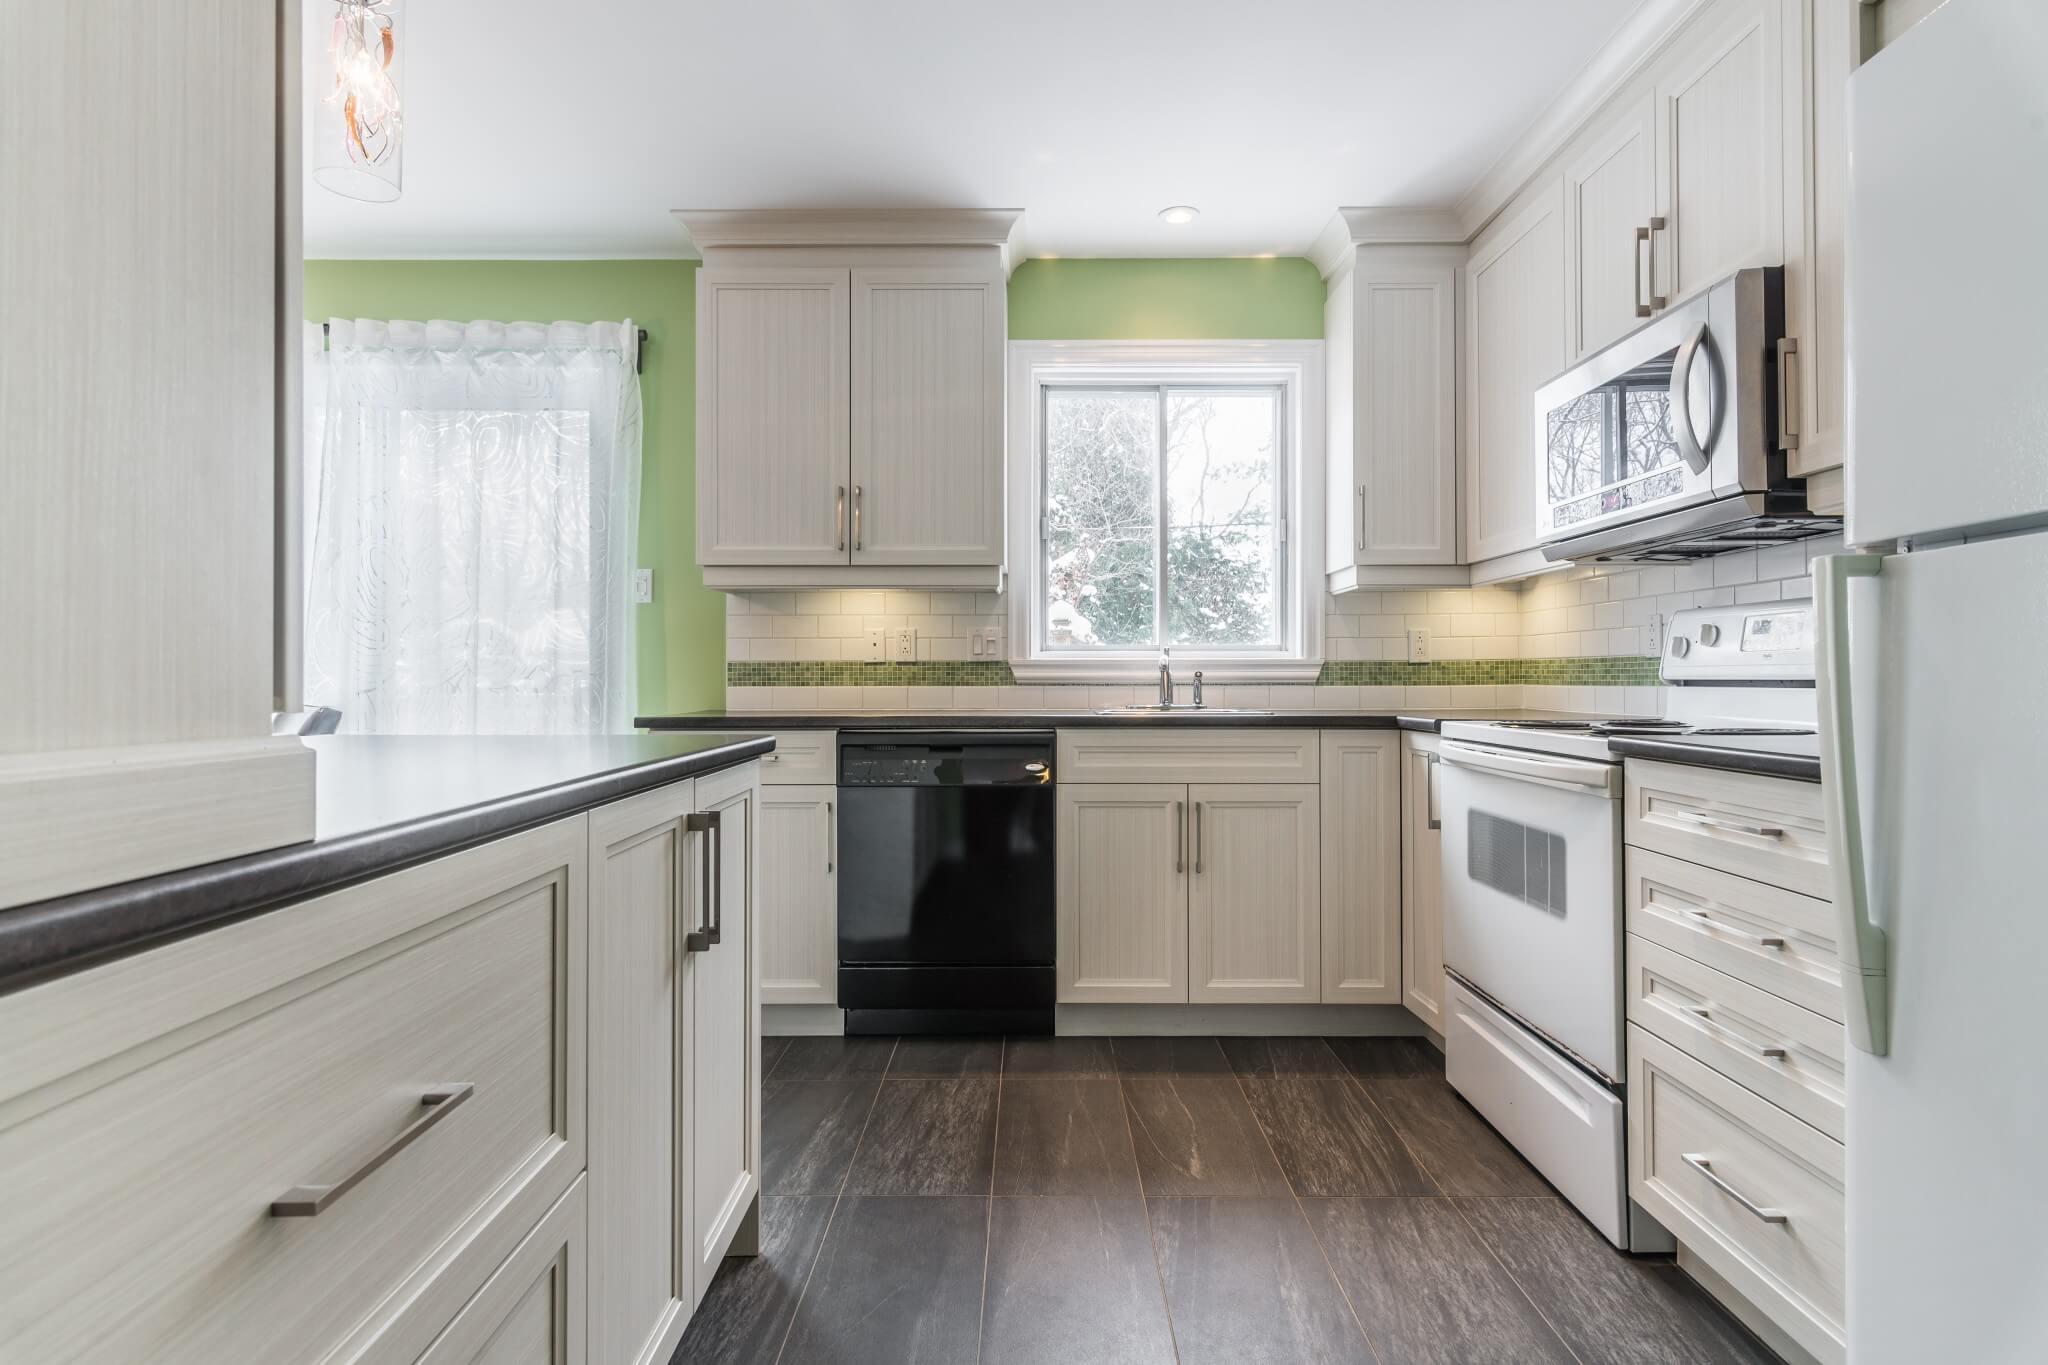 comptoirs et armoires de cuisine renove